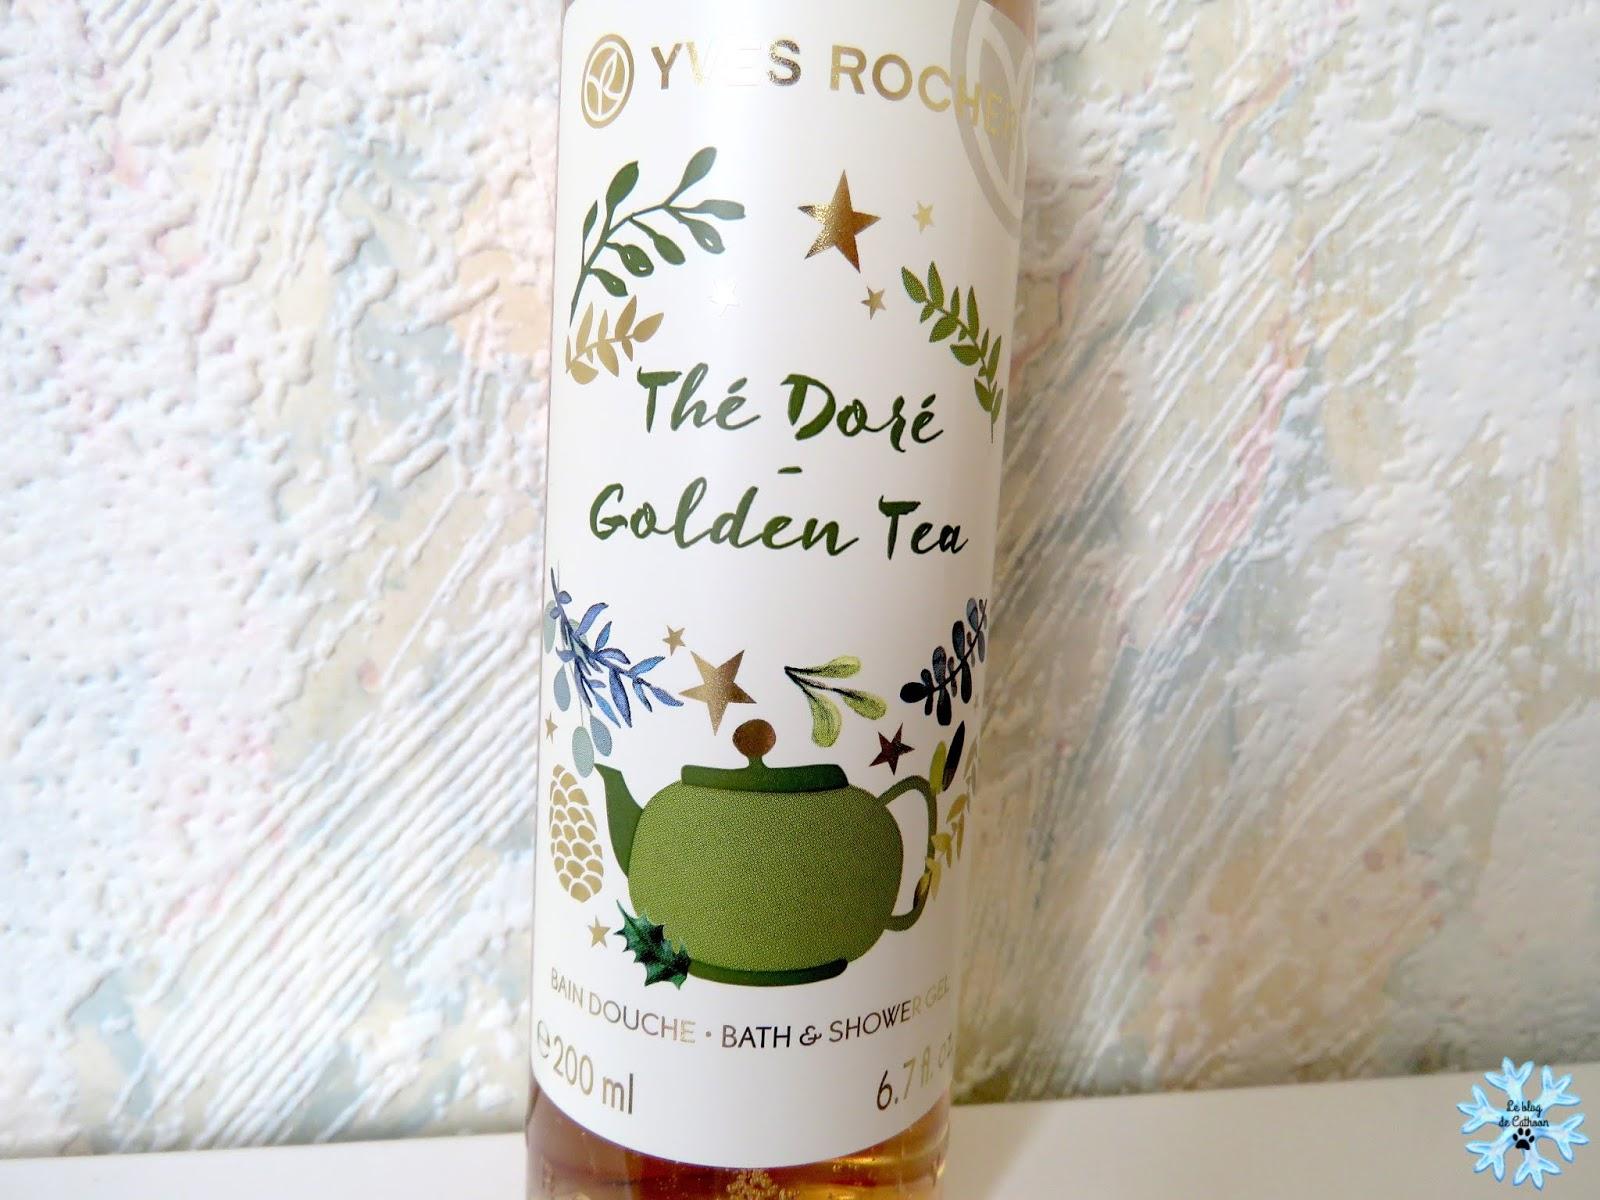 Thé Doré - Golden Tea - Gel Douche - Yves Rocher